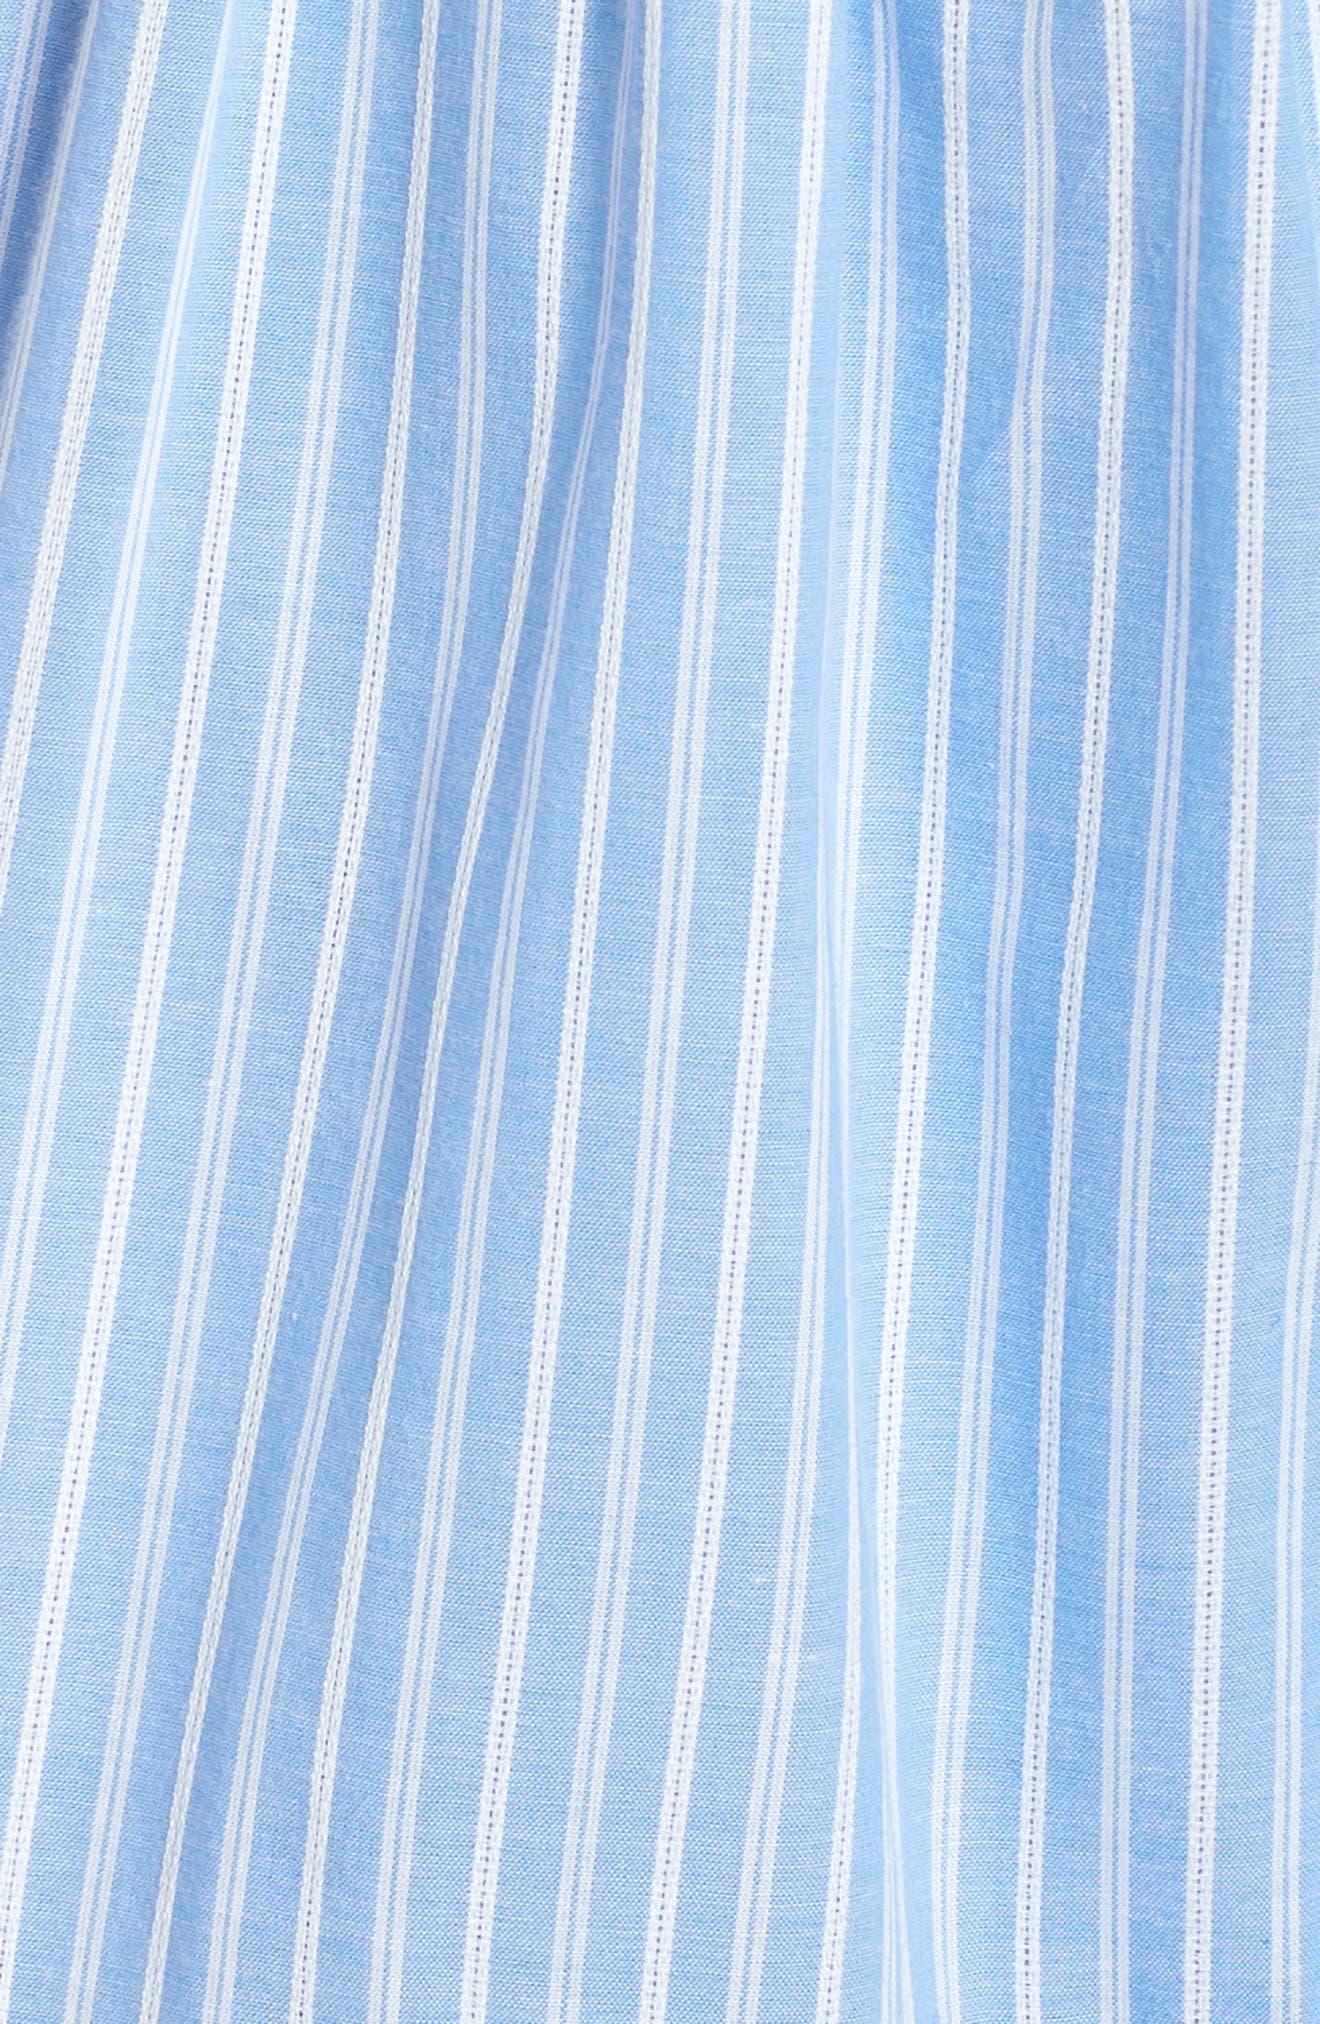 Courtney Rio Stripe Lawn Maxi Dress,                             Alternate thumbnail 7, color,                             Blue/ White